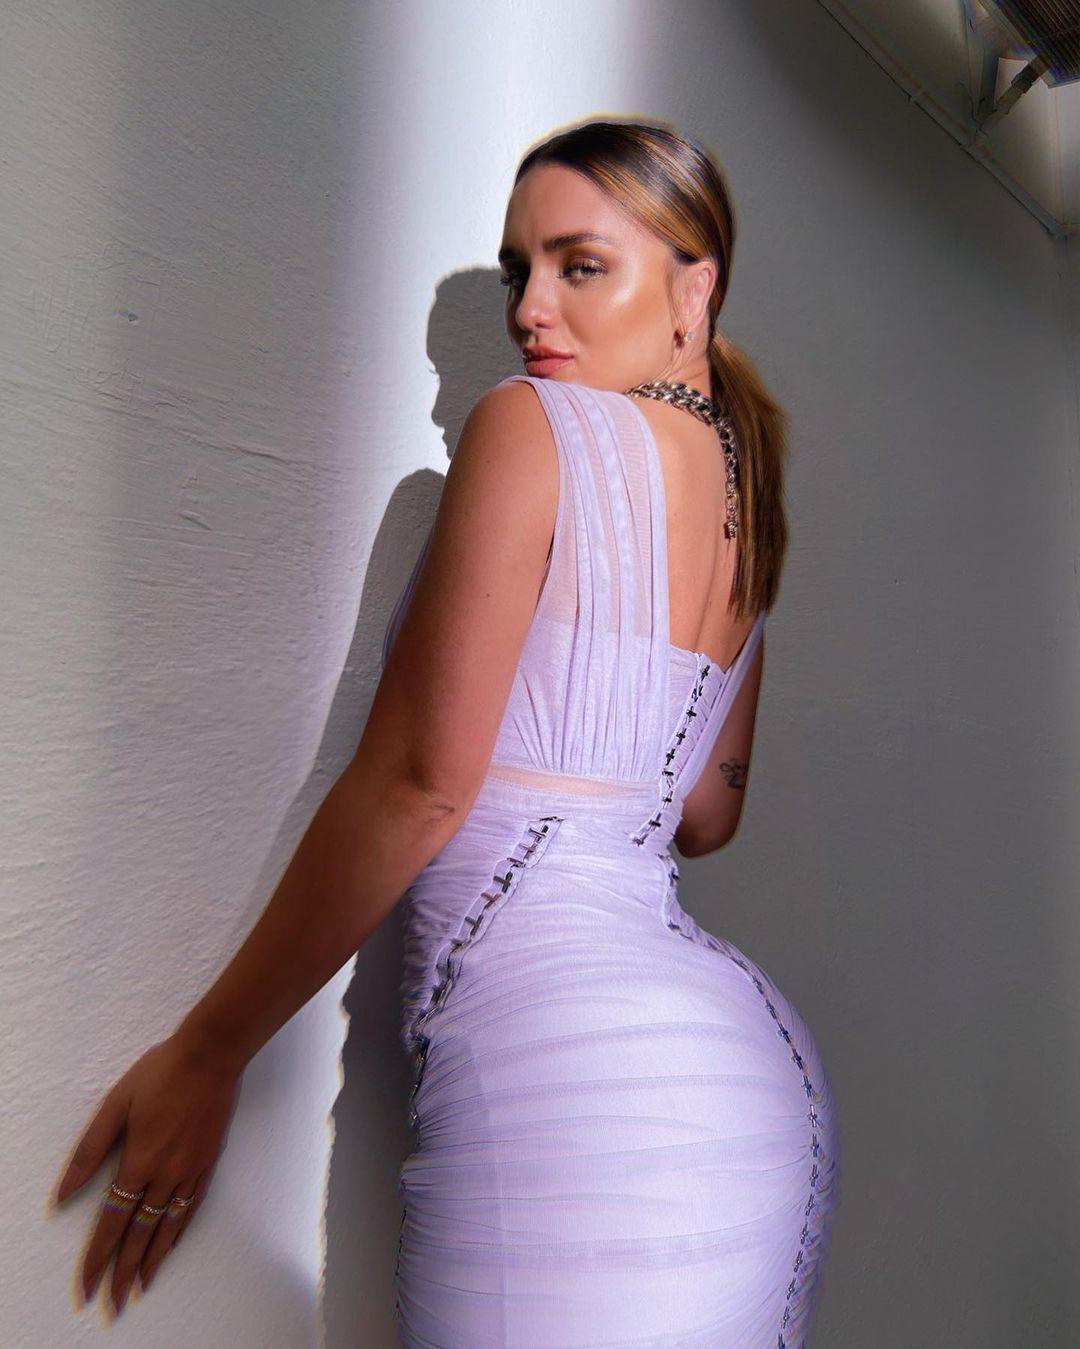 Rafa Kalimann com um belo vestido lilás - 02